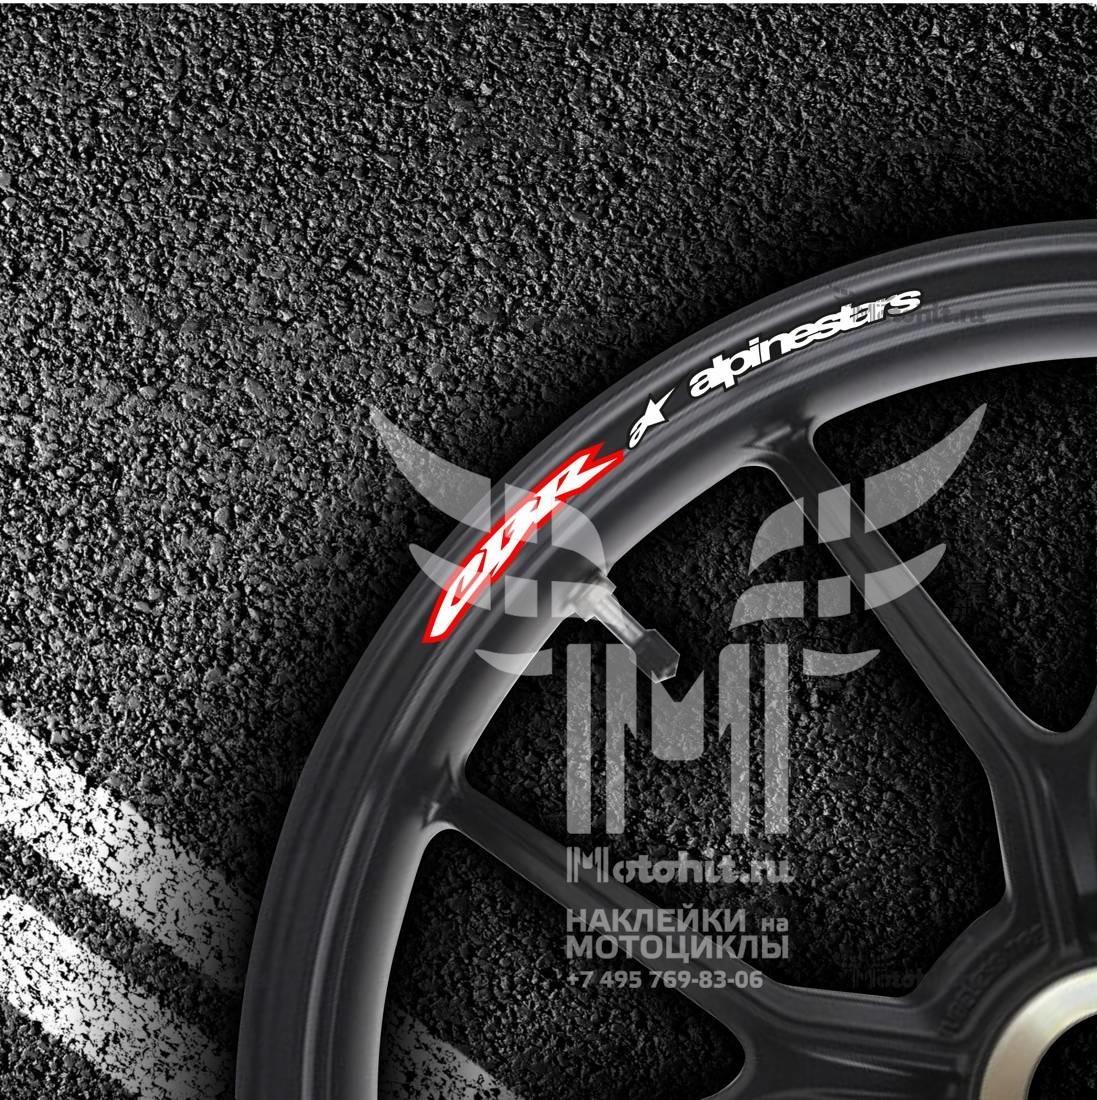 Комплект наклеек на обод колеса мотоцикла HONDA CBR-ALPINESTARS